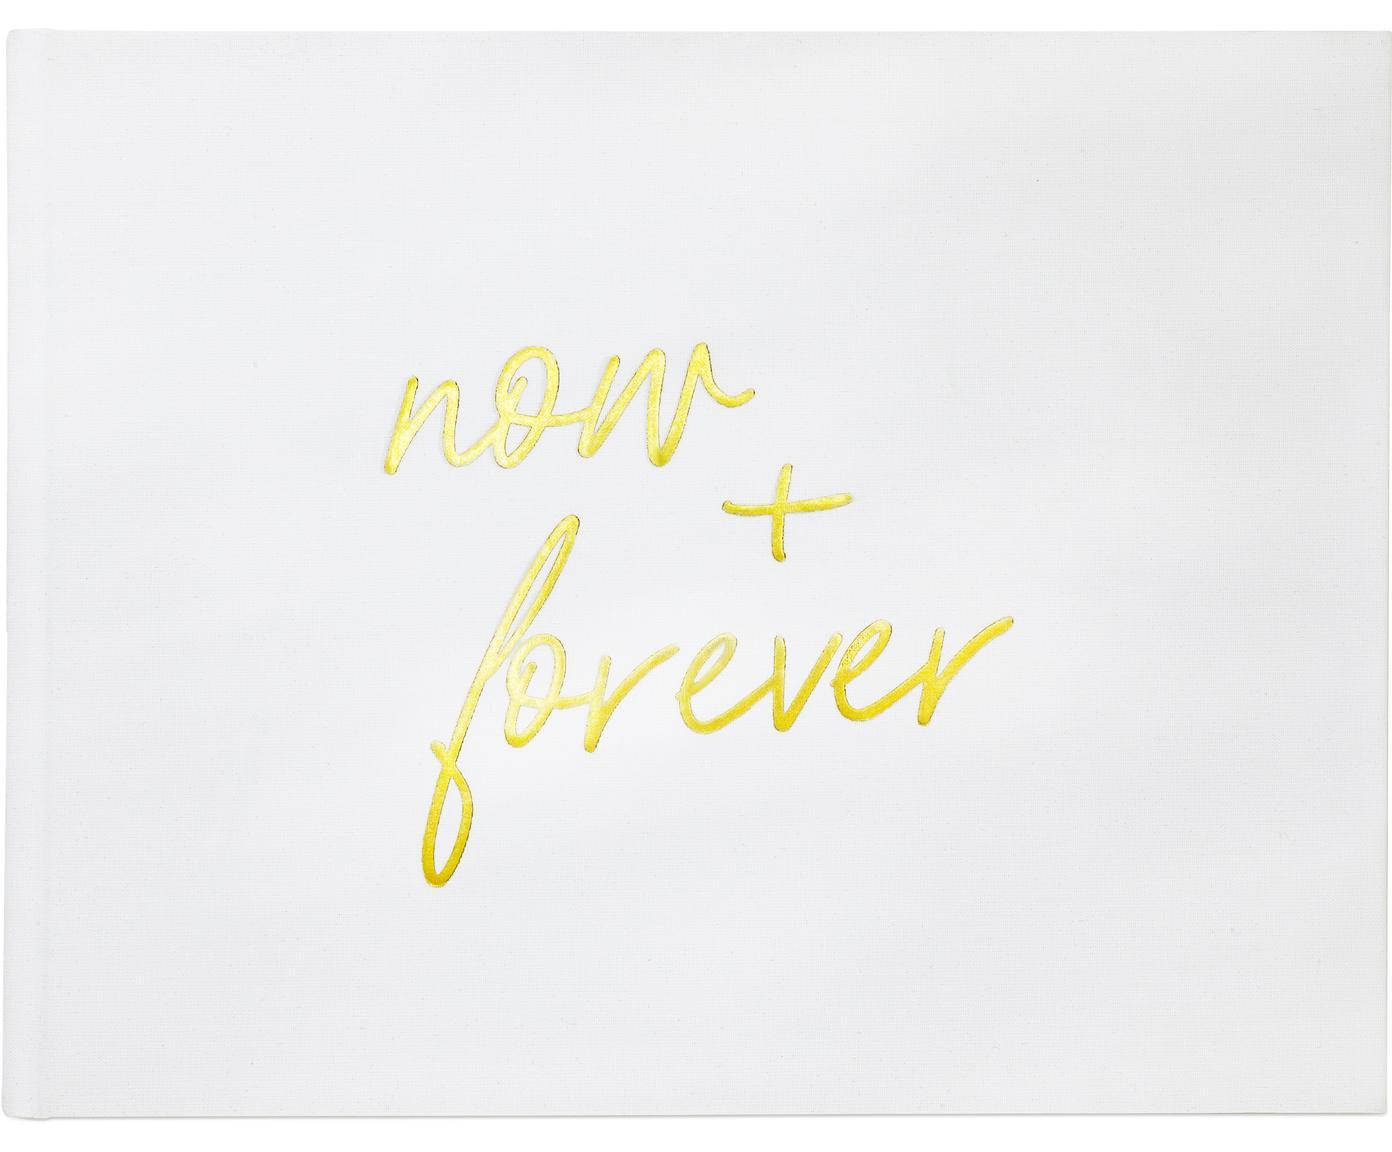 Gästebuch Now&Forever, Weiss, Goldfarben, 28 x 22 cm